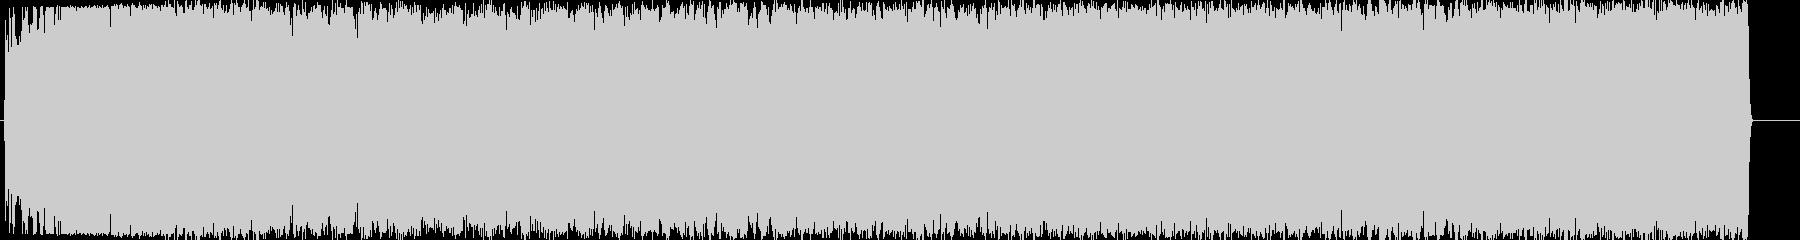 SFチックな大きな機械の起動音の未再生の波形